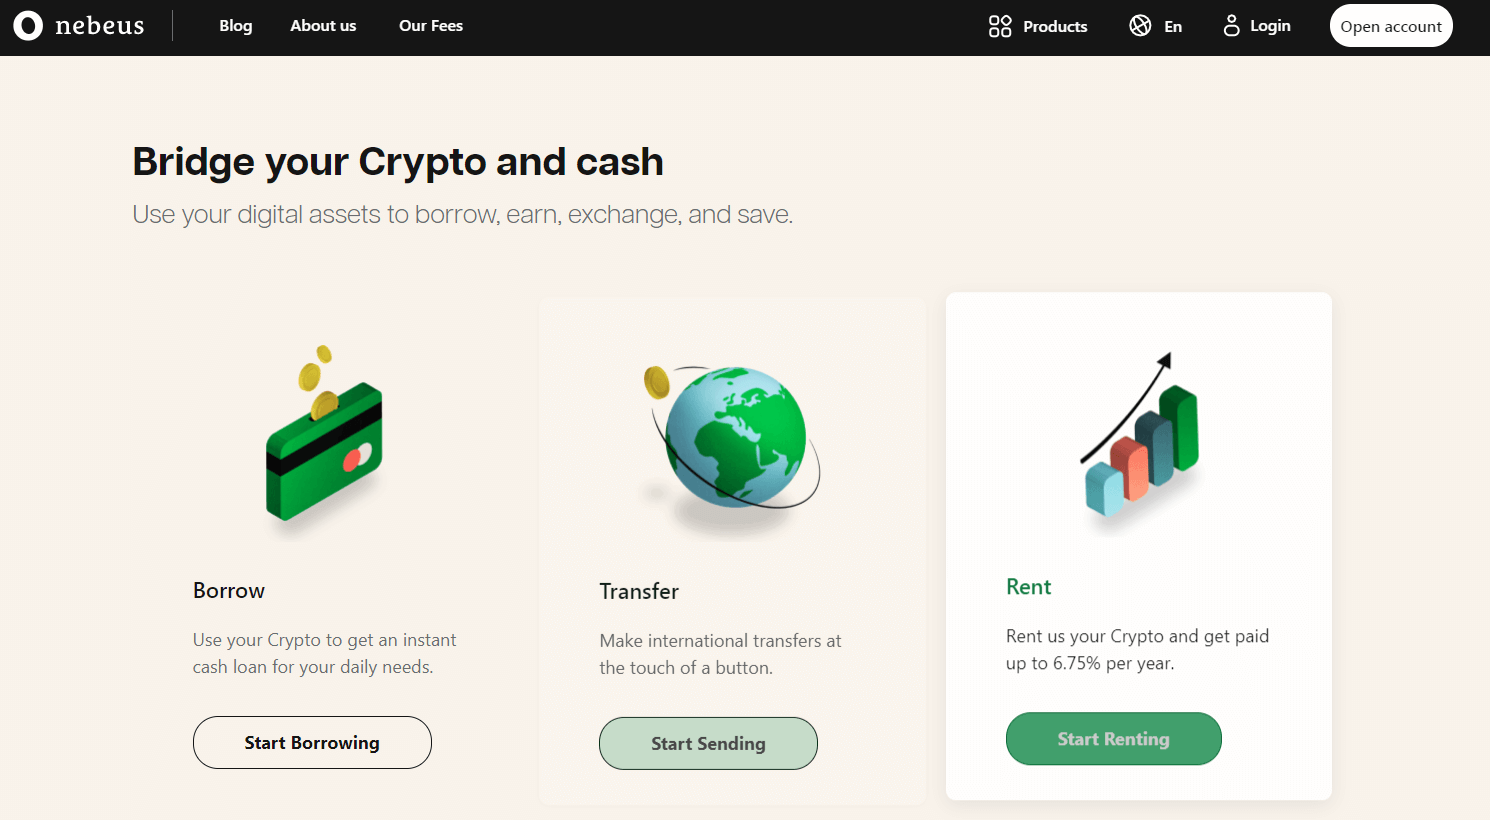 Nebeus Website